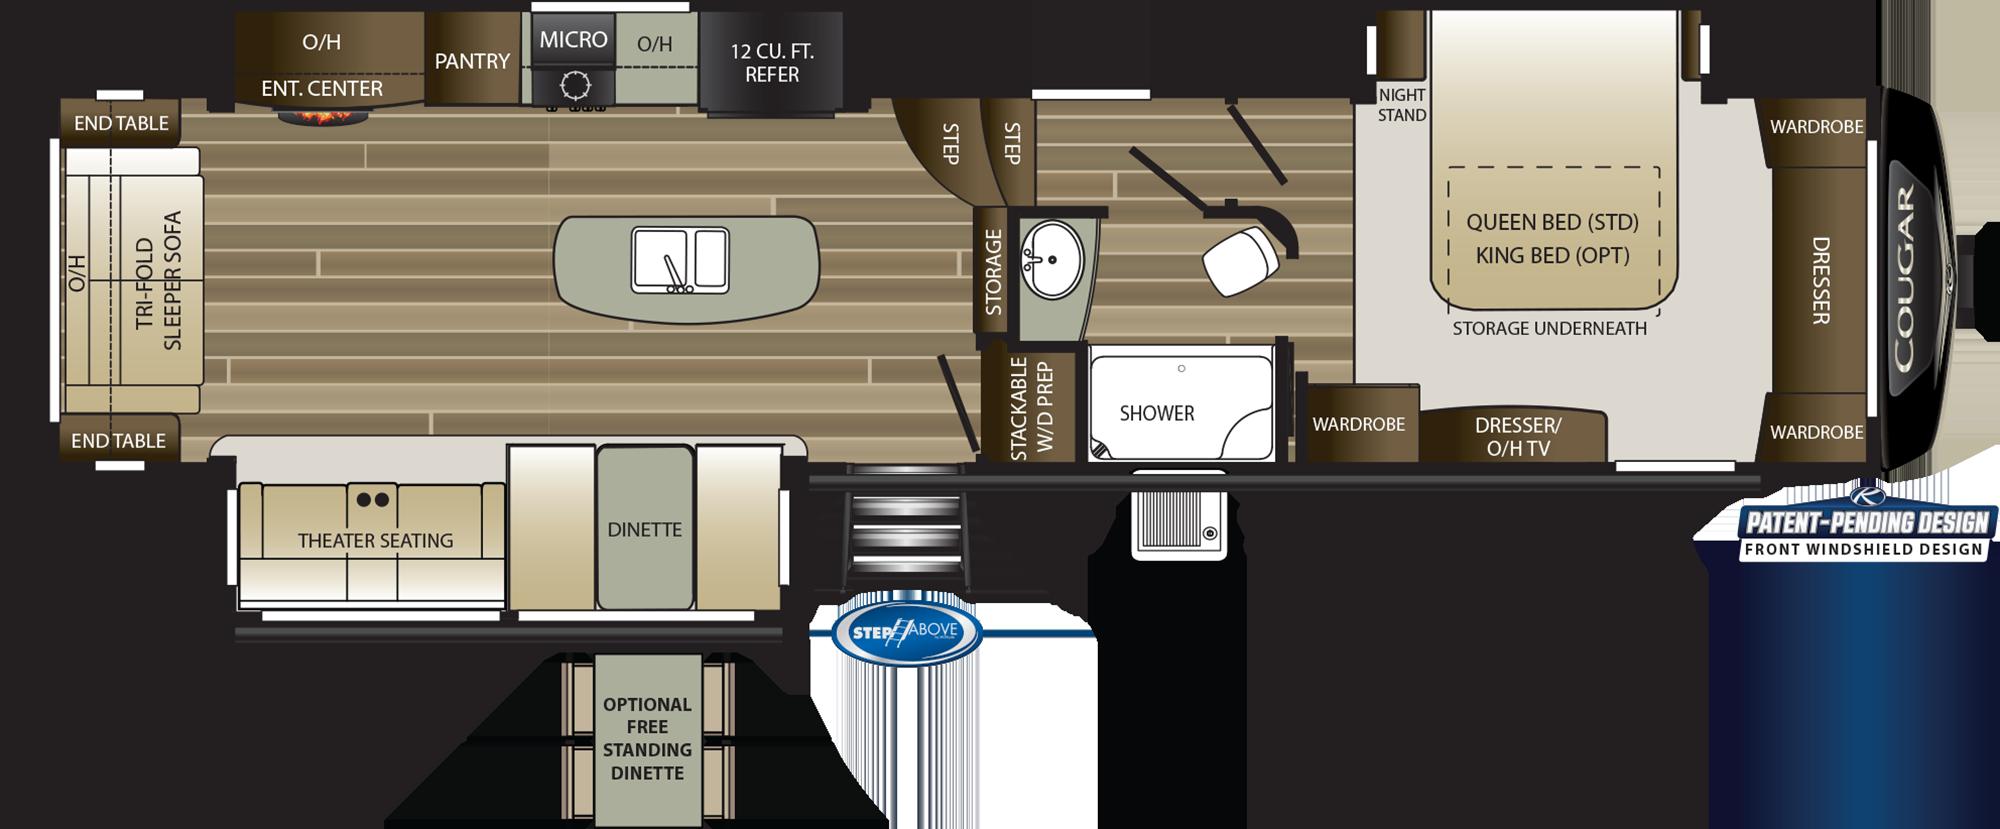 2019 KEYSTONE COUGAR 361RLS (couples) Floorplan